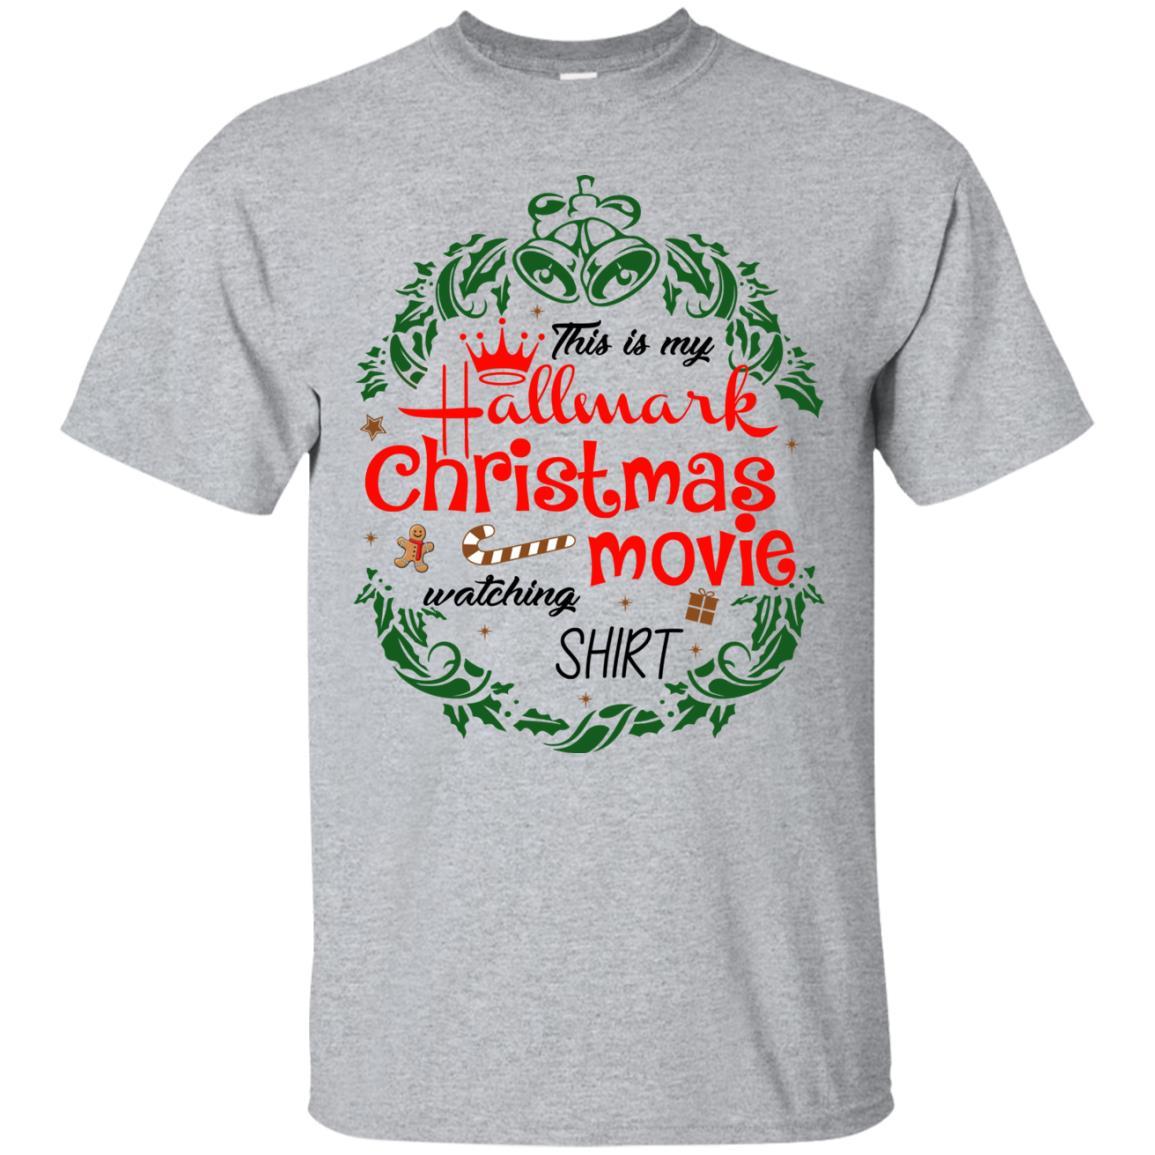 Hallmark Christmas Shirt.This Is My Hallmark Christmas Movie Watching Shirt